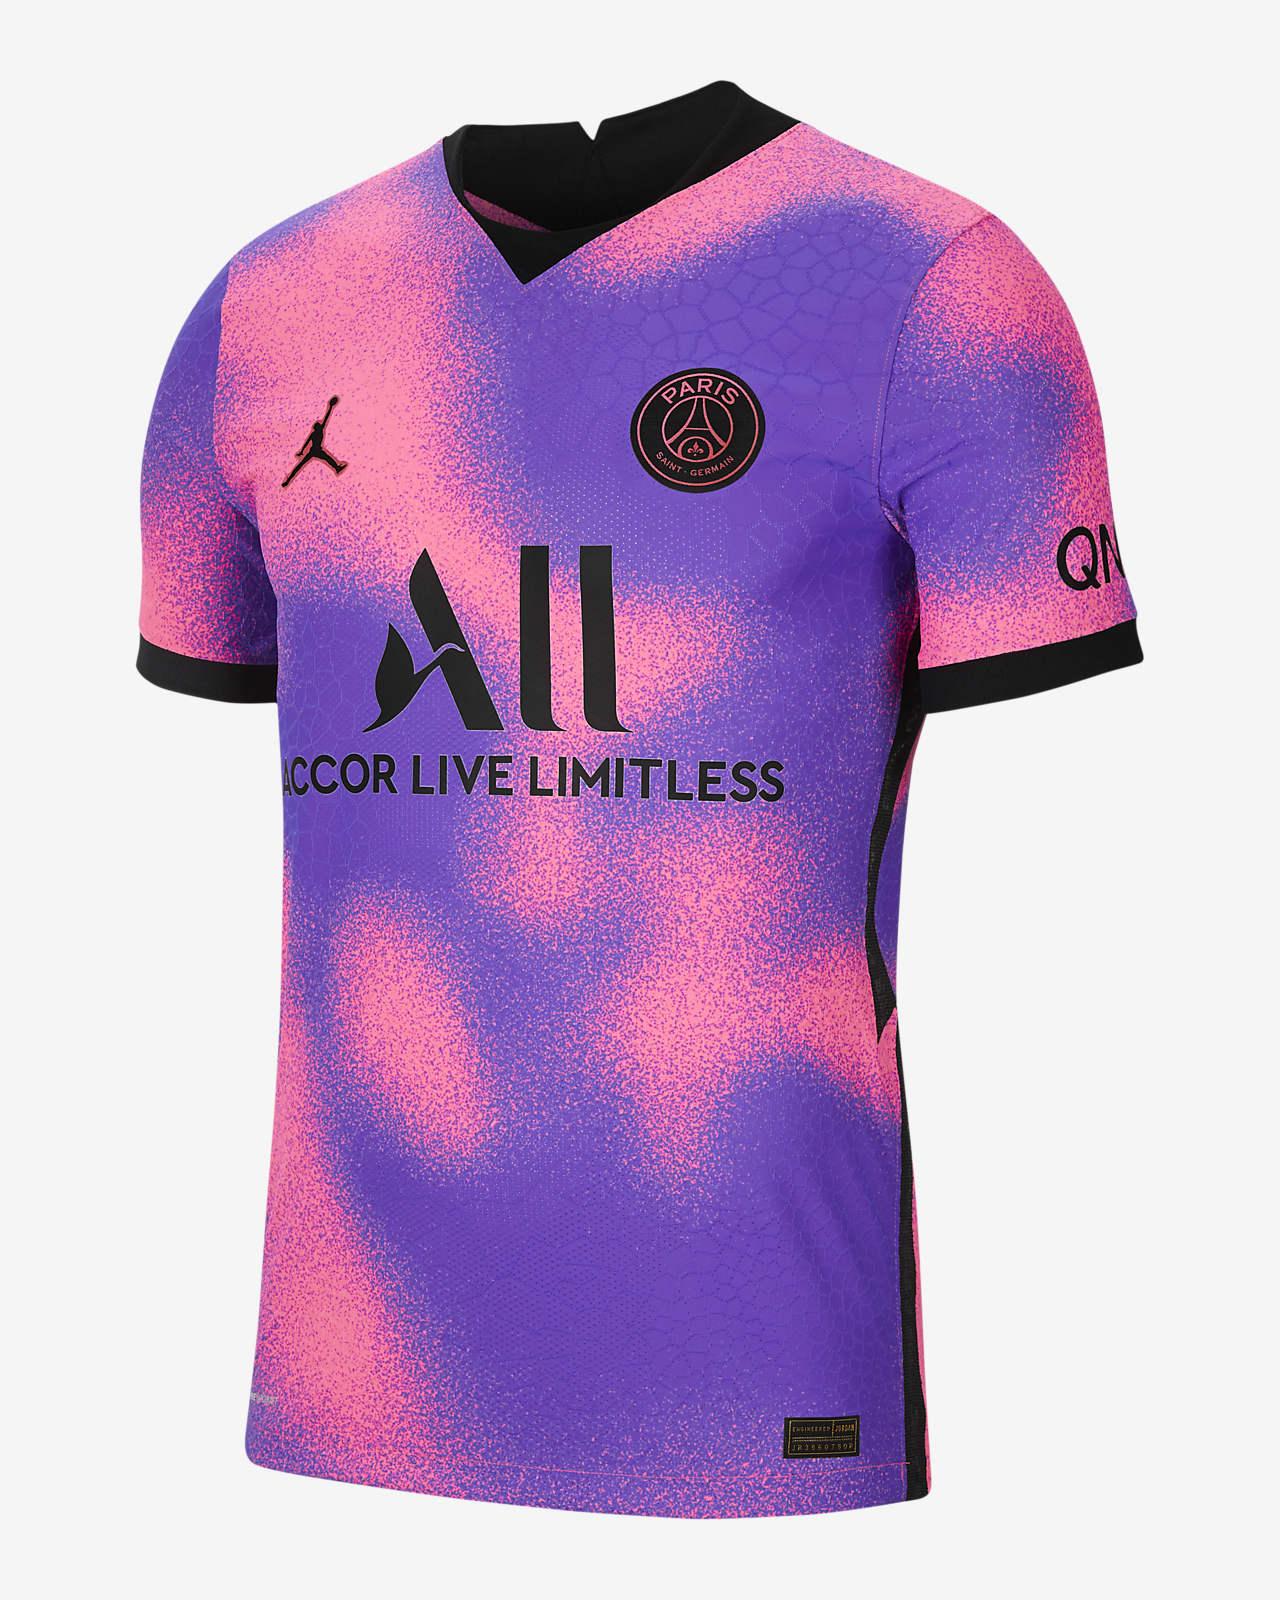 Camisola de futebol Paris Saint-Germain 2021/22 Vapor Match Fourth para homem